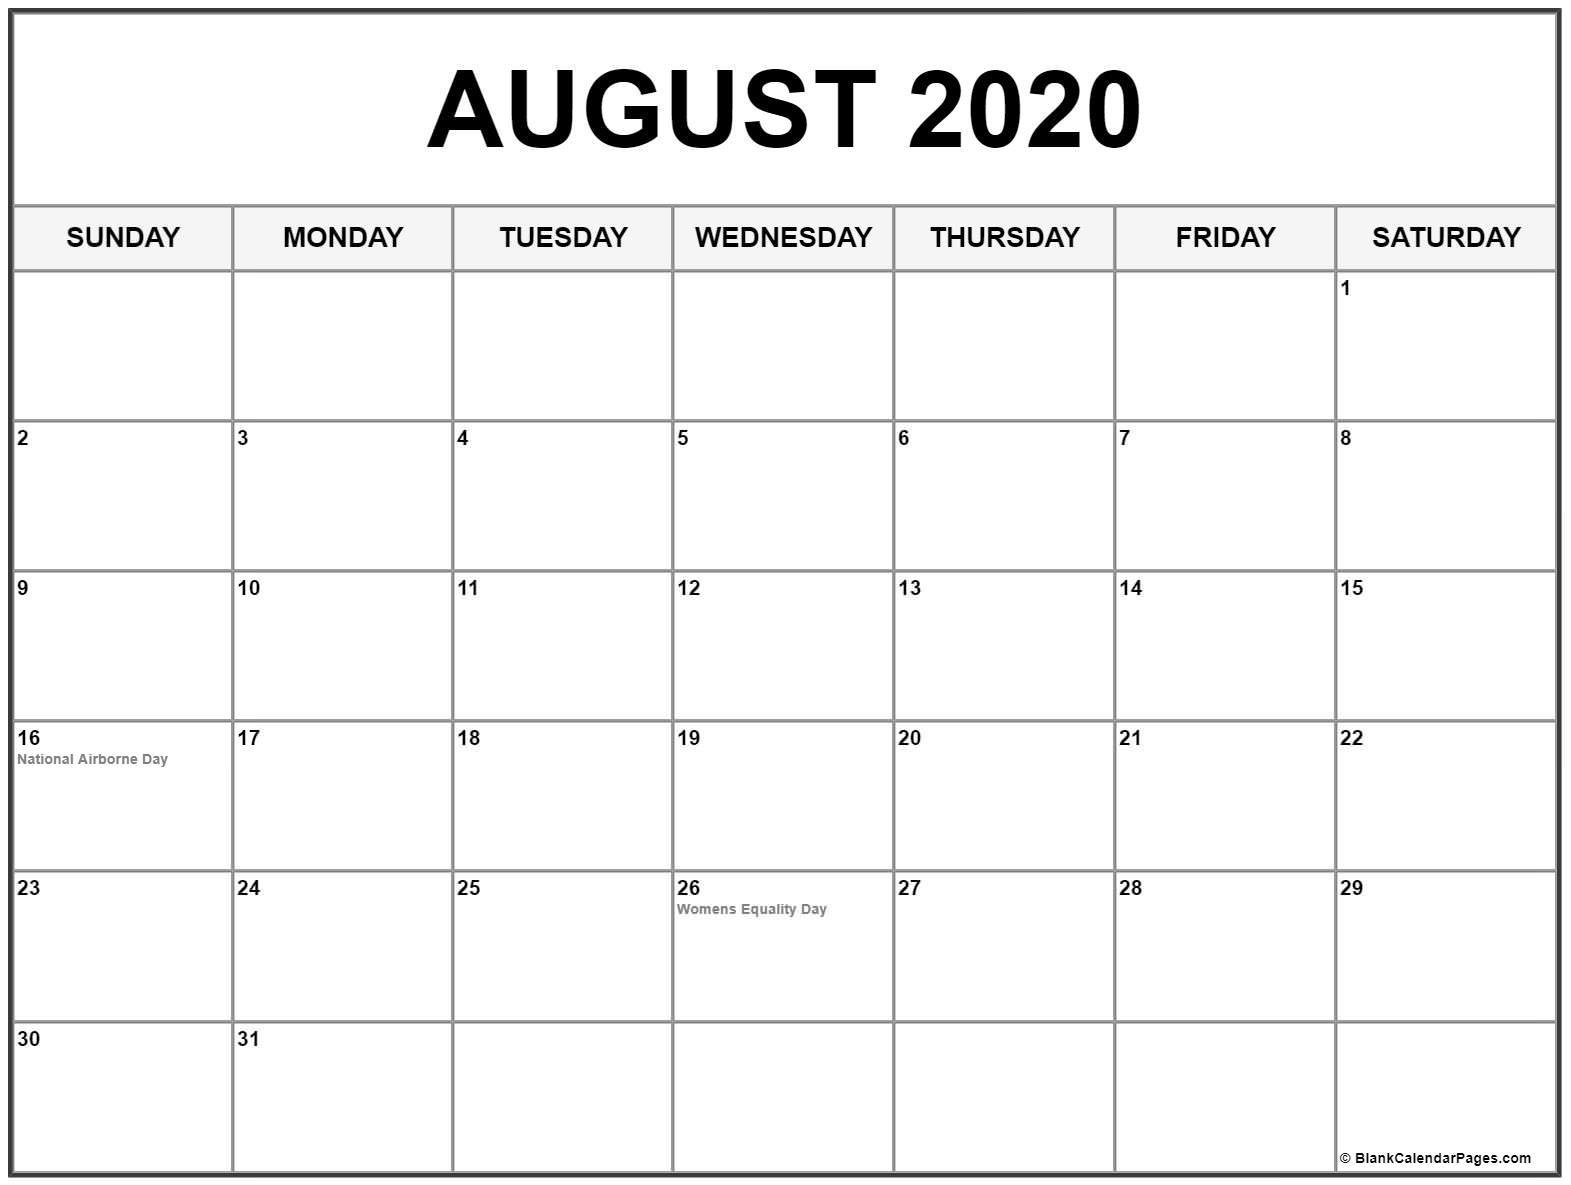 Remarkable 2020 Calendar List Of Holidays • Printable Blank-Calendar Of Jewish Holidays October 2020